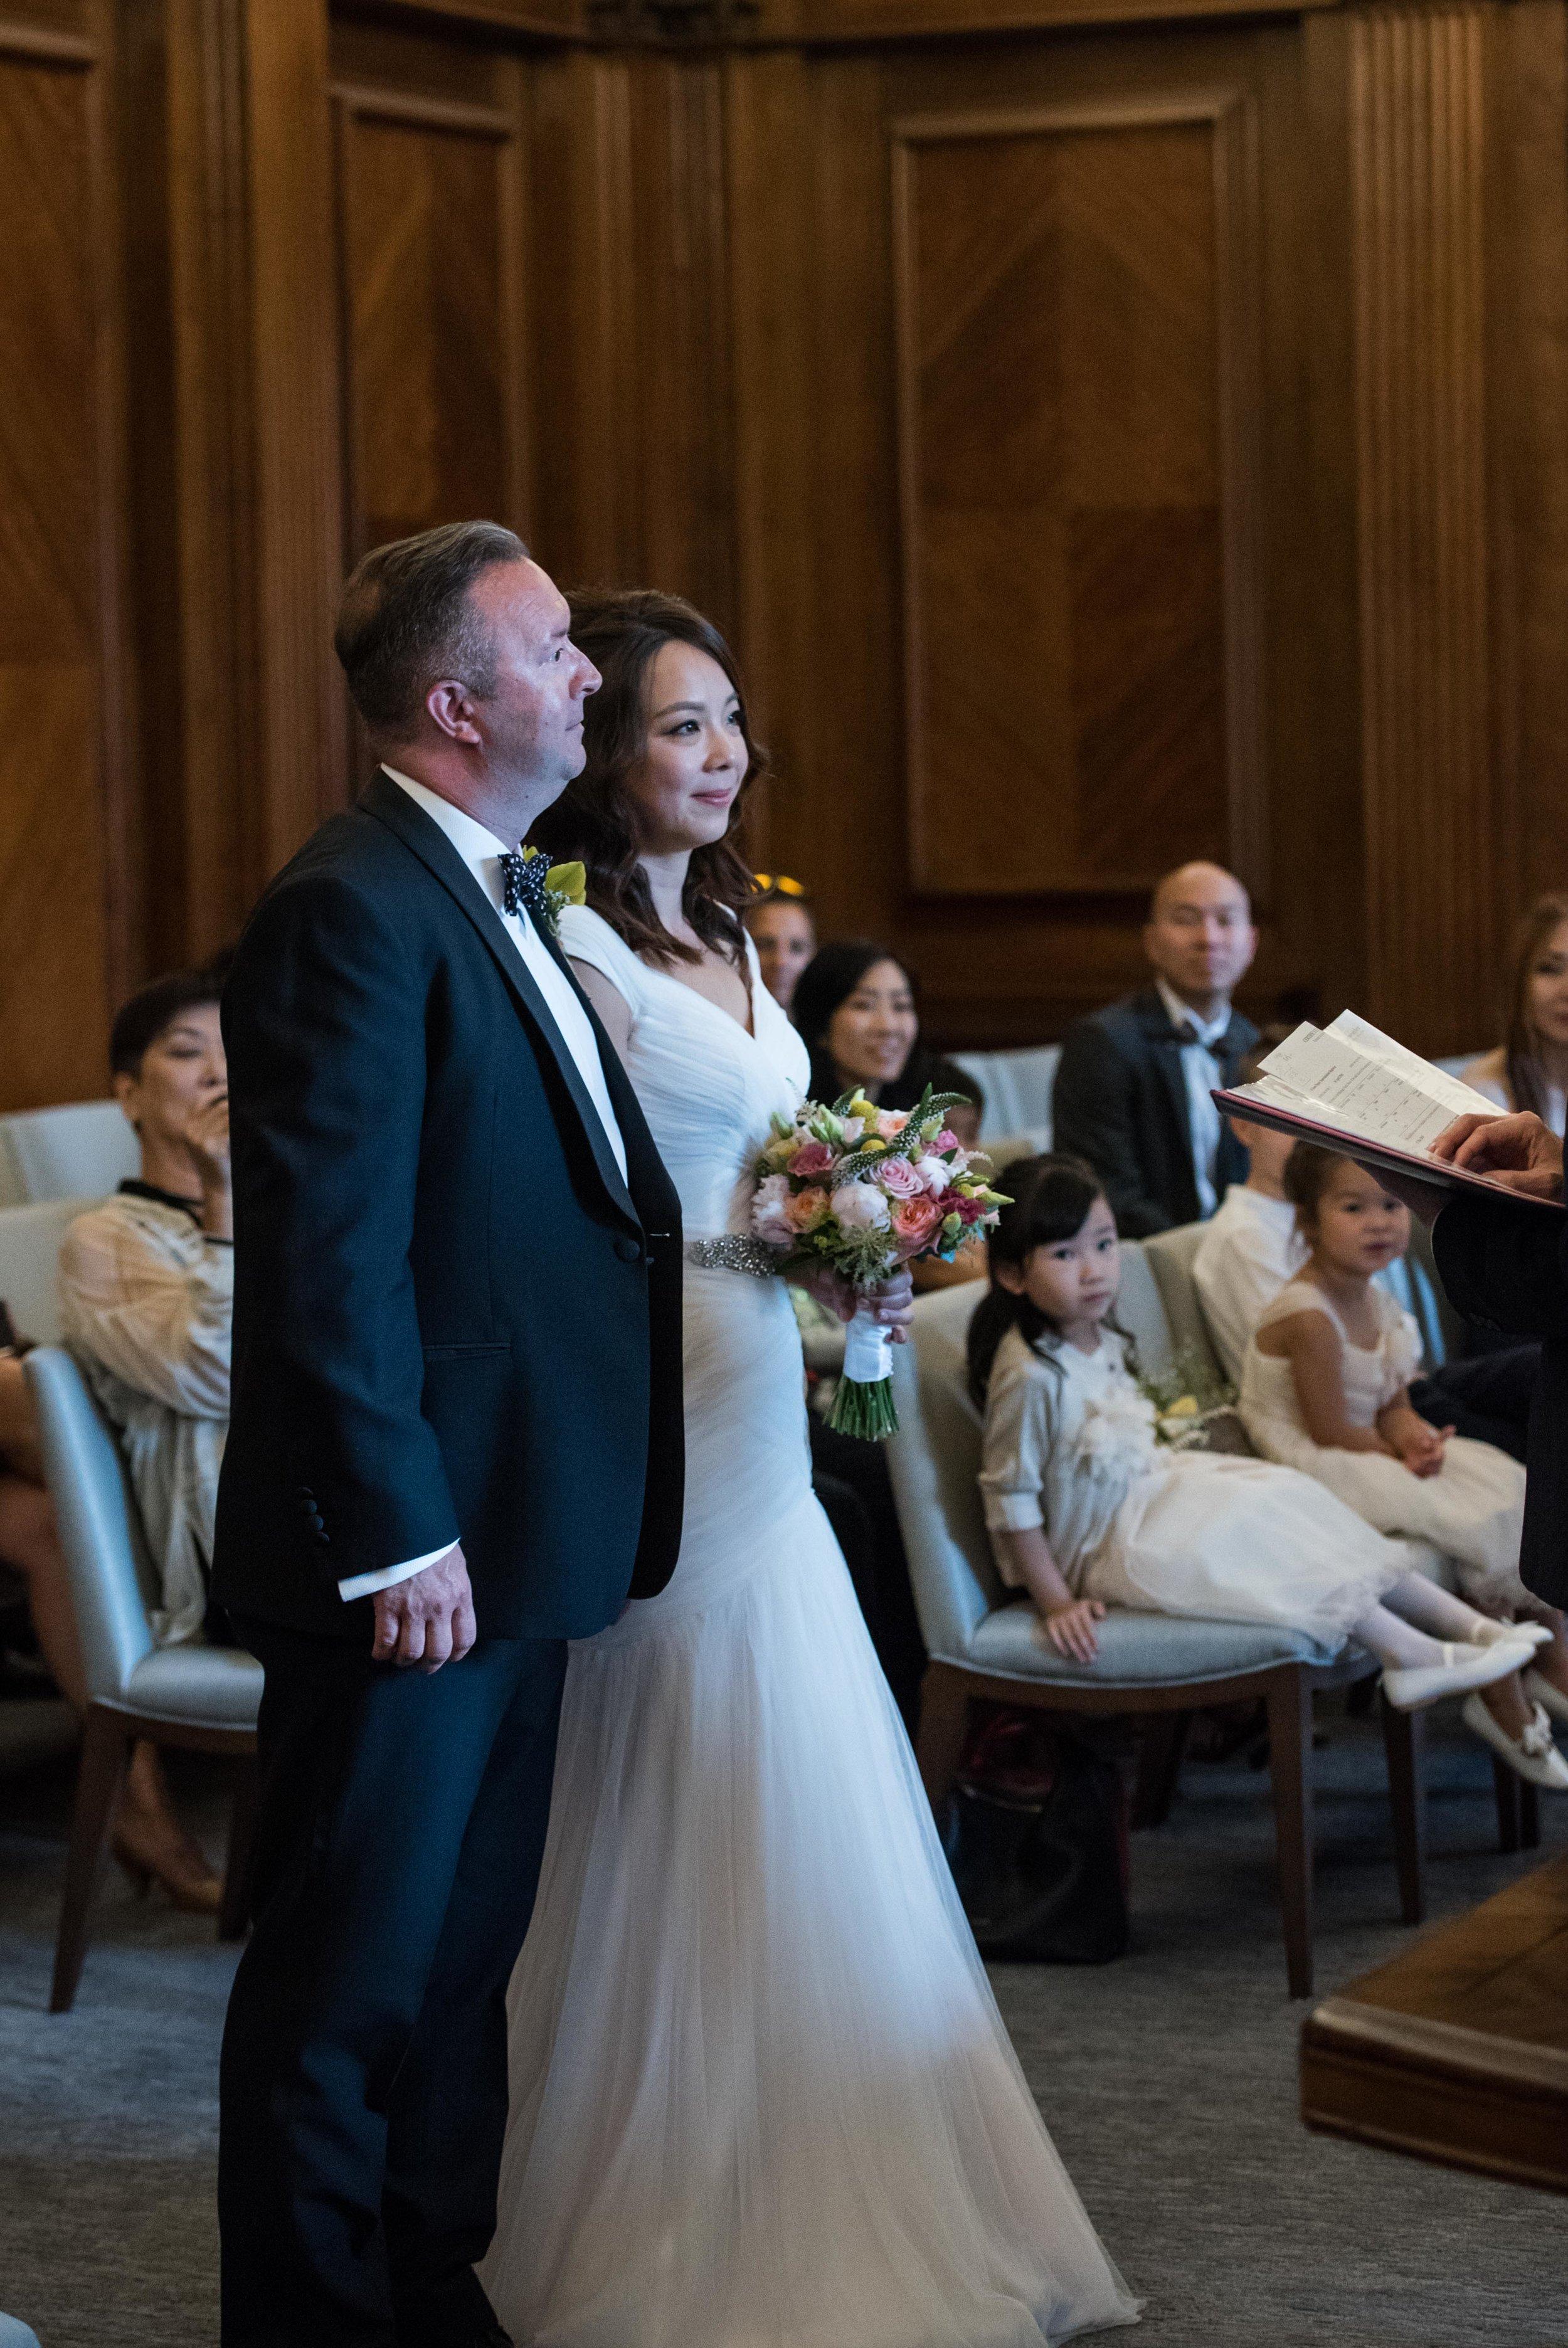 D&M_Marylebone Town Hall Wedding (97 of 239).jpg